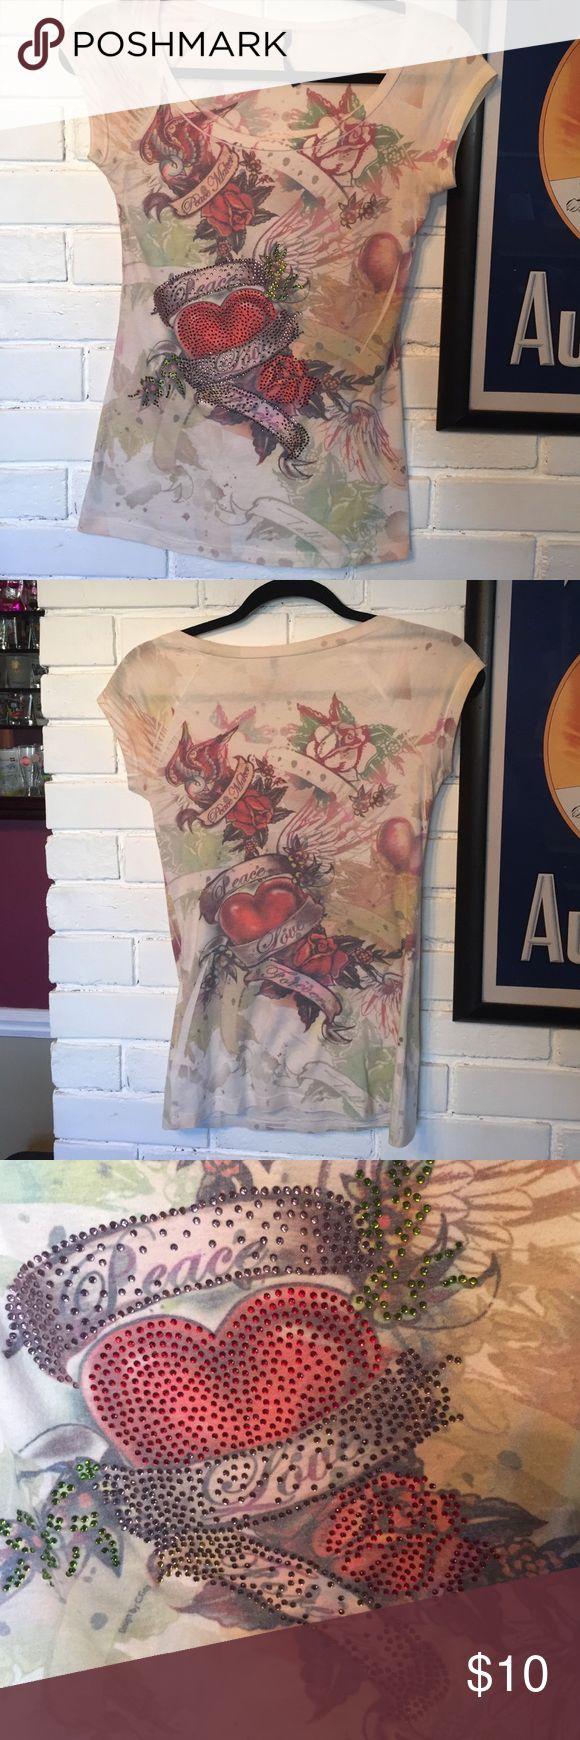 Tee shirt Peace maker t-shirt Tops Tees - Short Sleeve